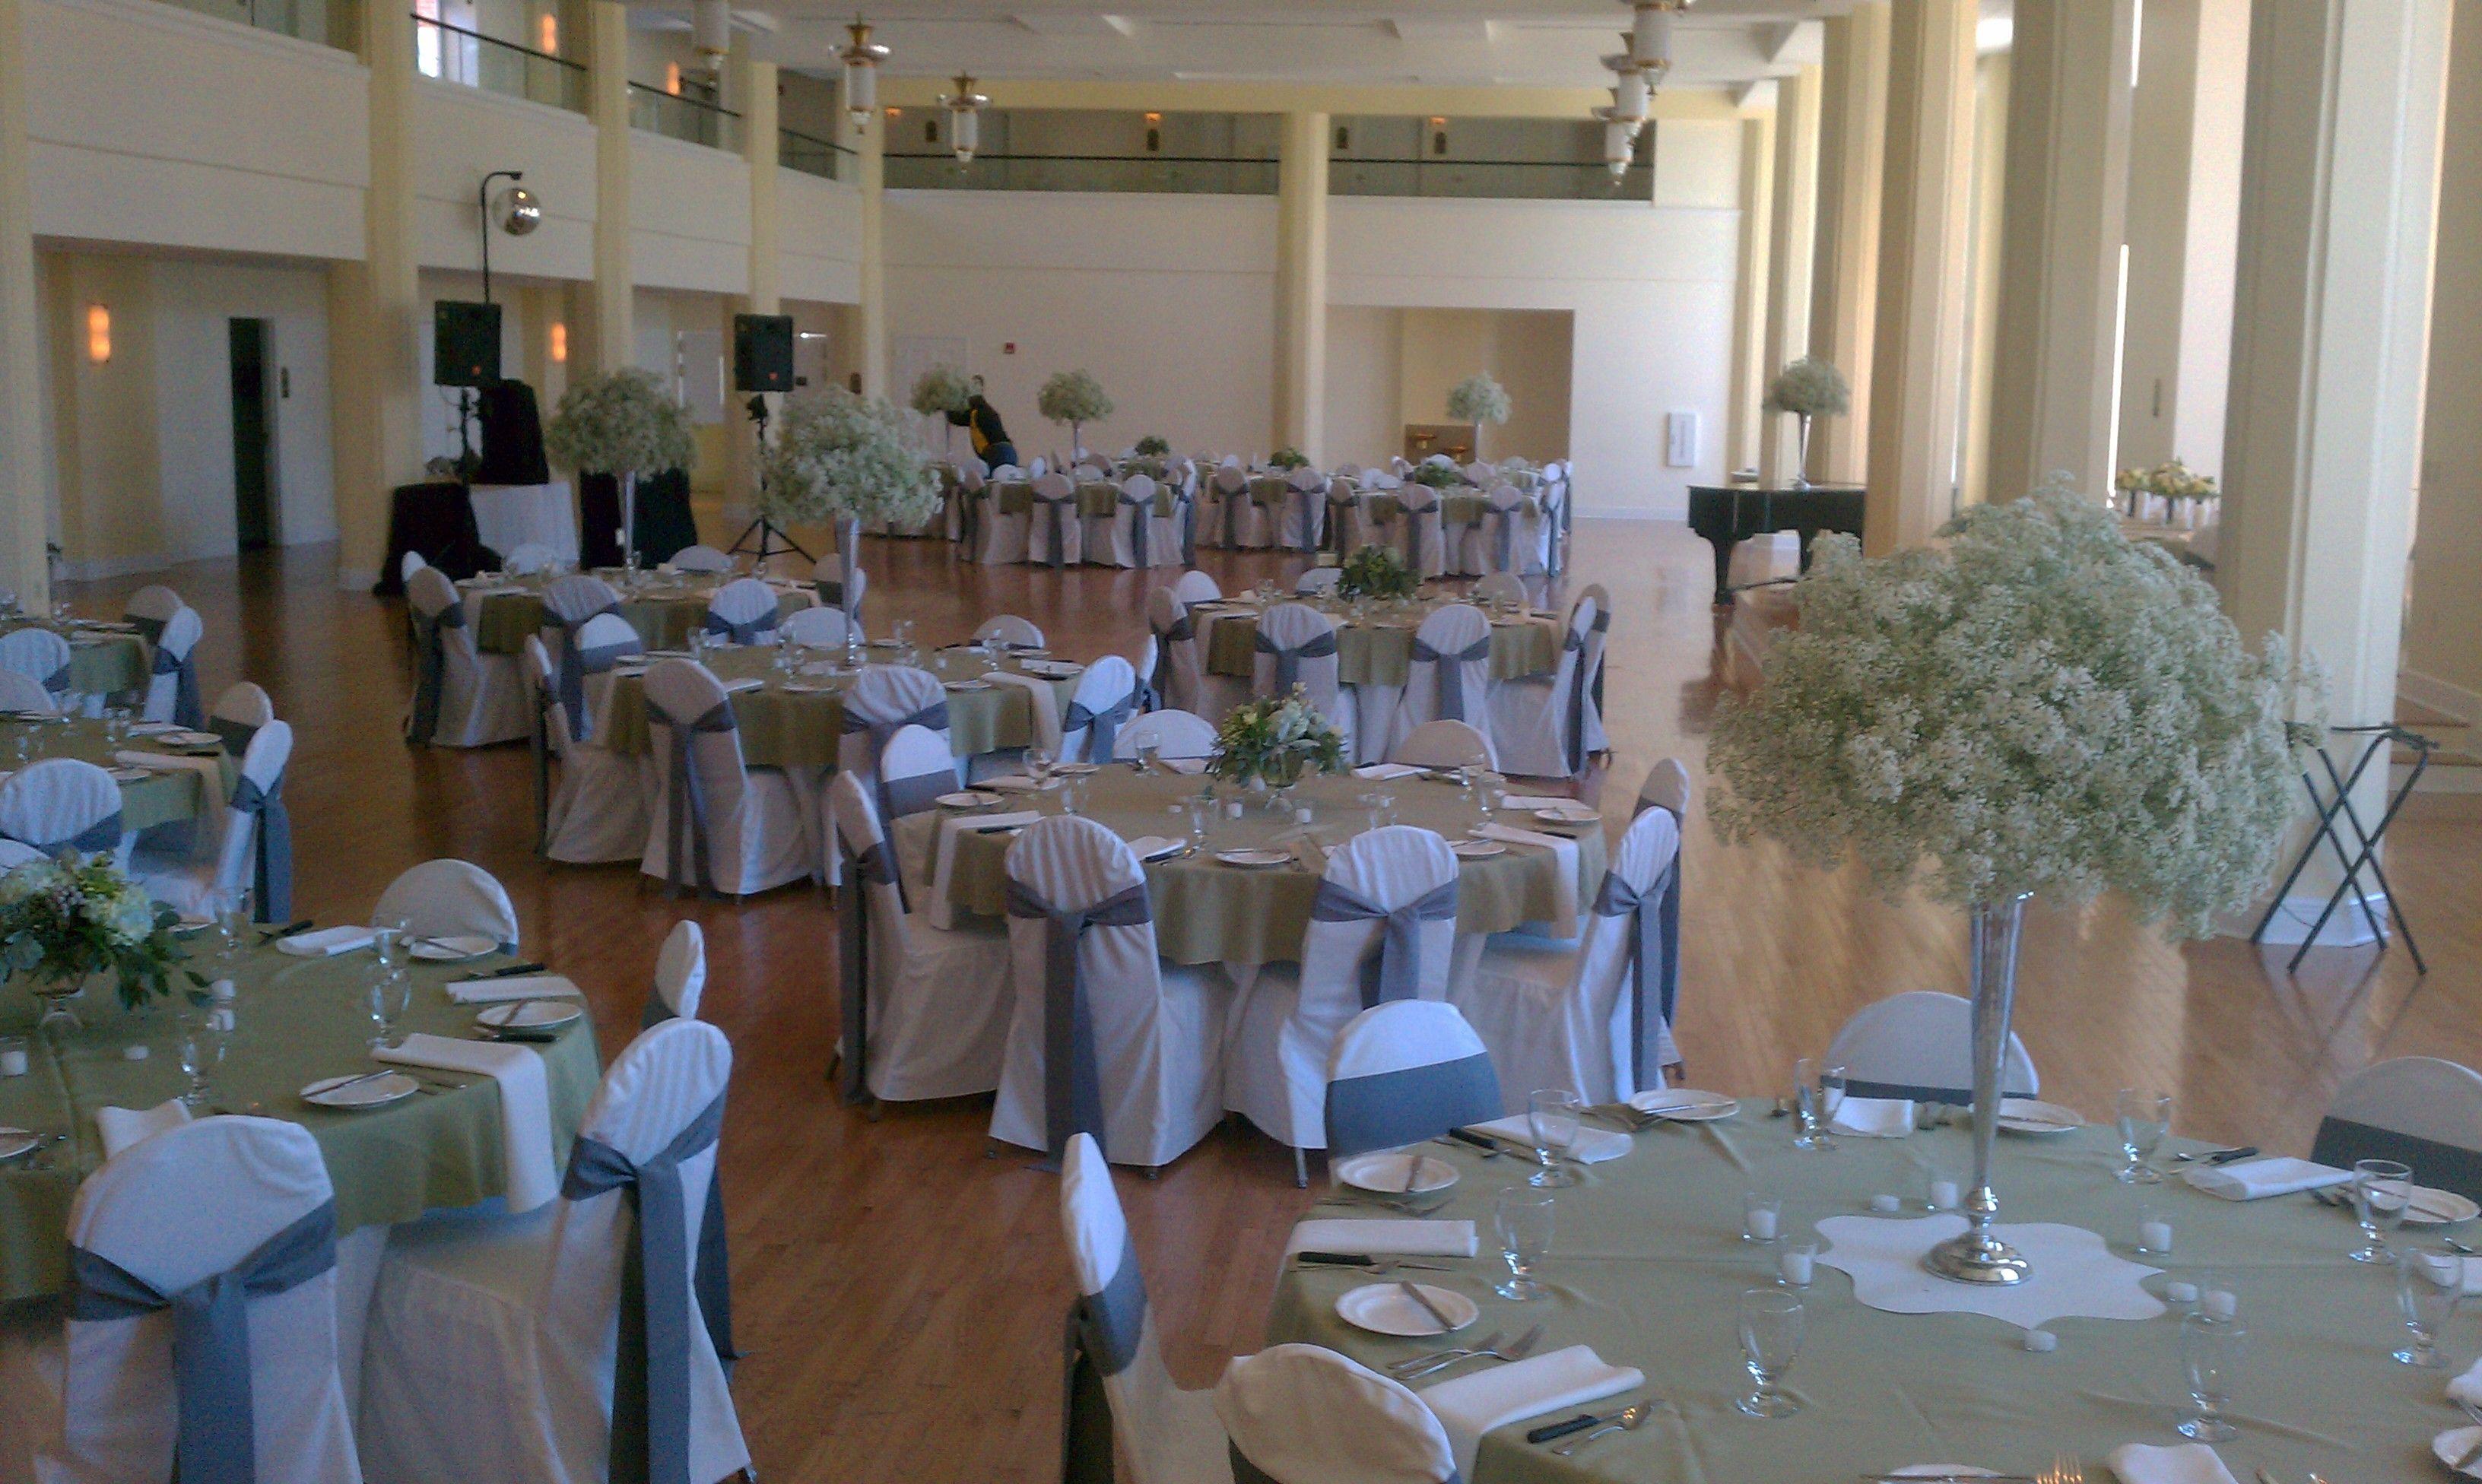 allens flowers inc columbia mo wedding